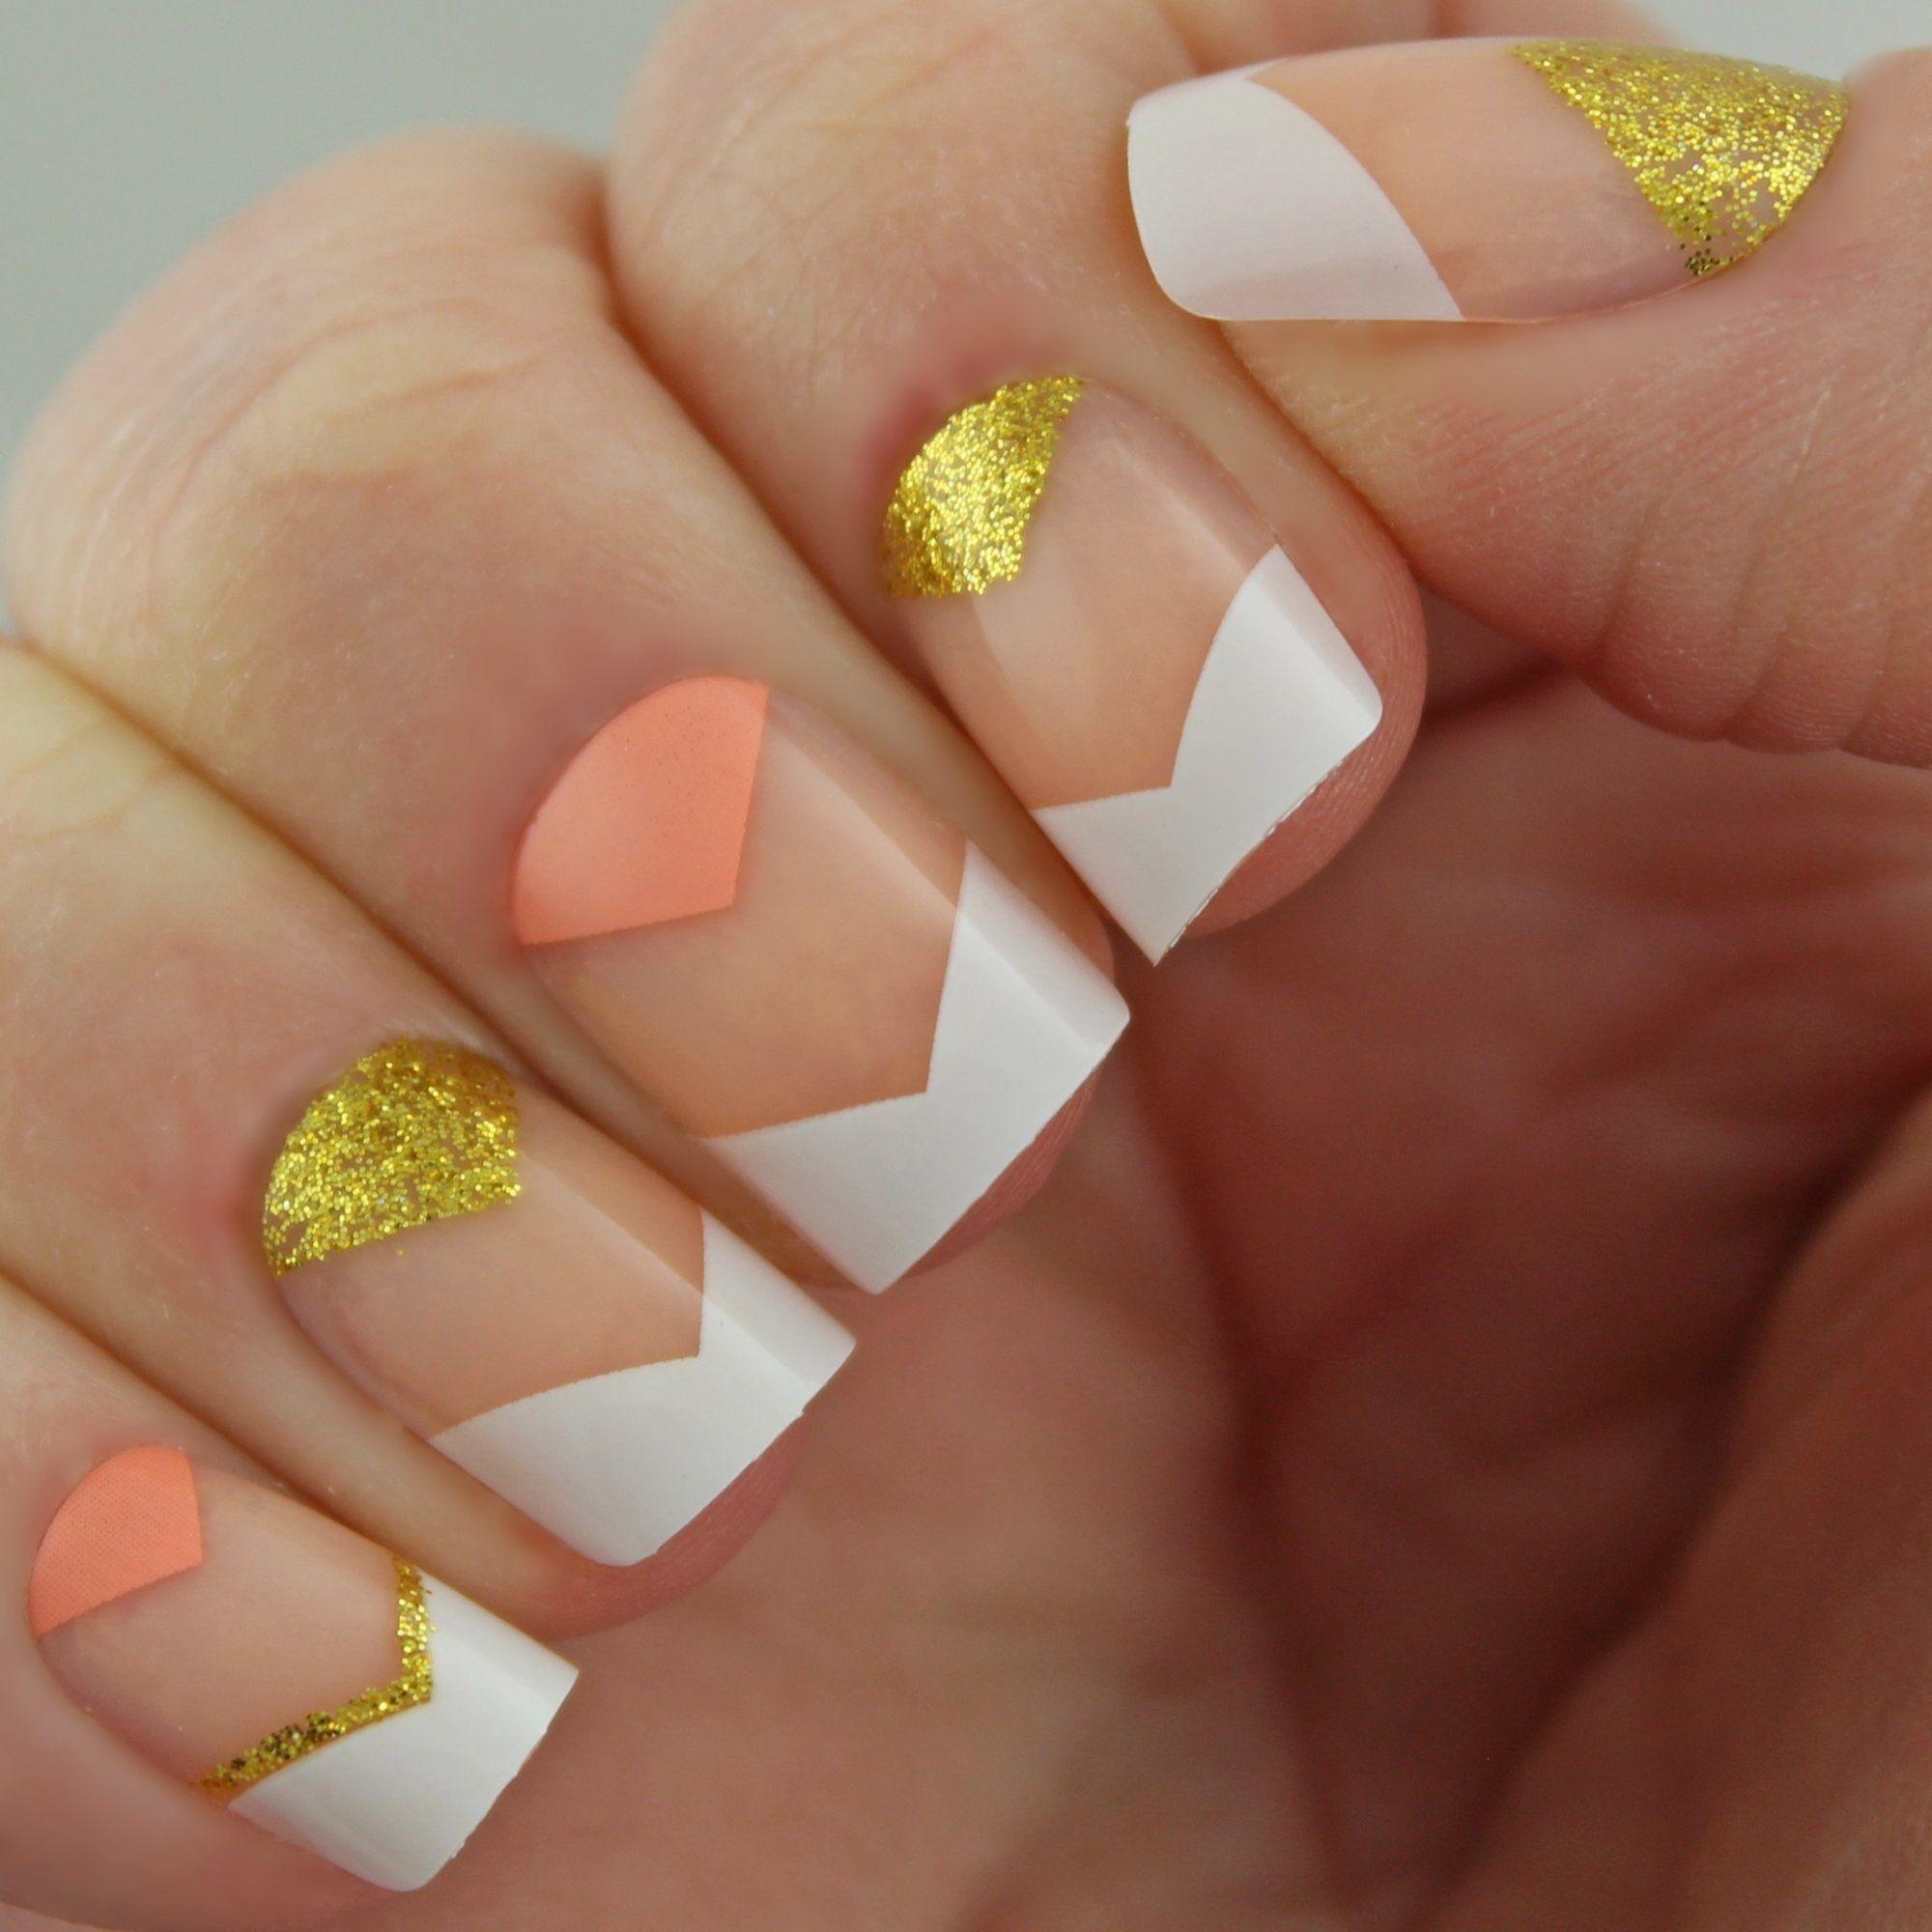 Get Festival Ready With Pretty Woman Designer Nail Kits | Nail It ...